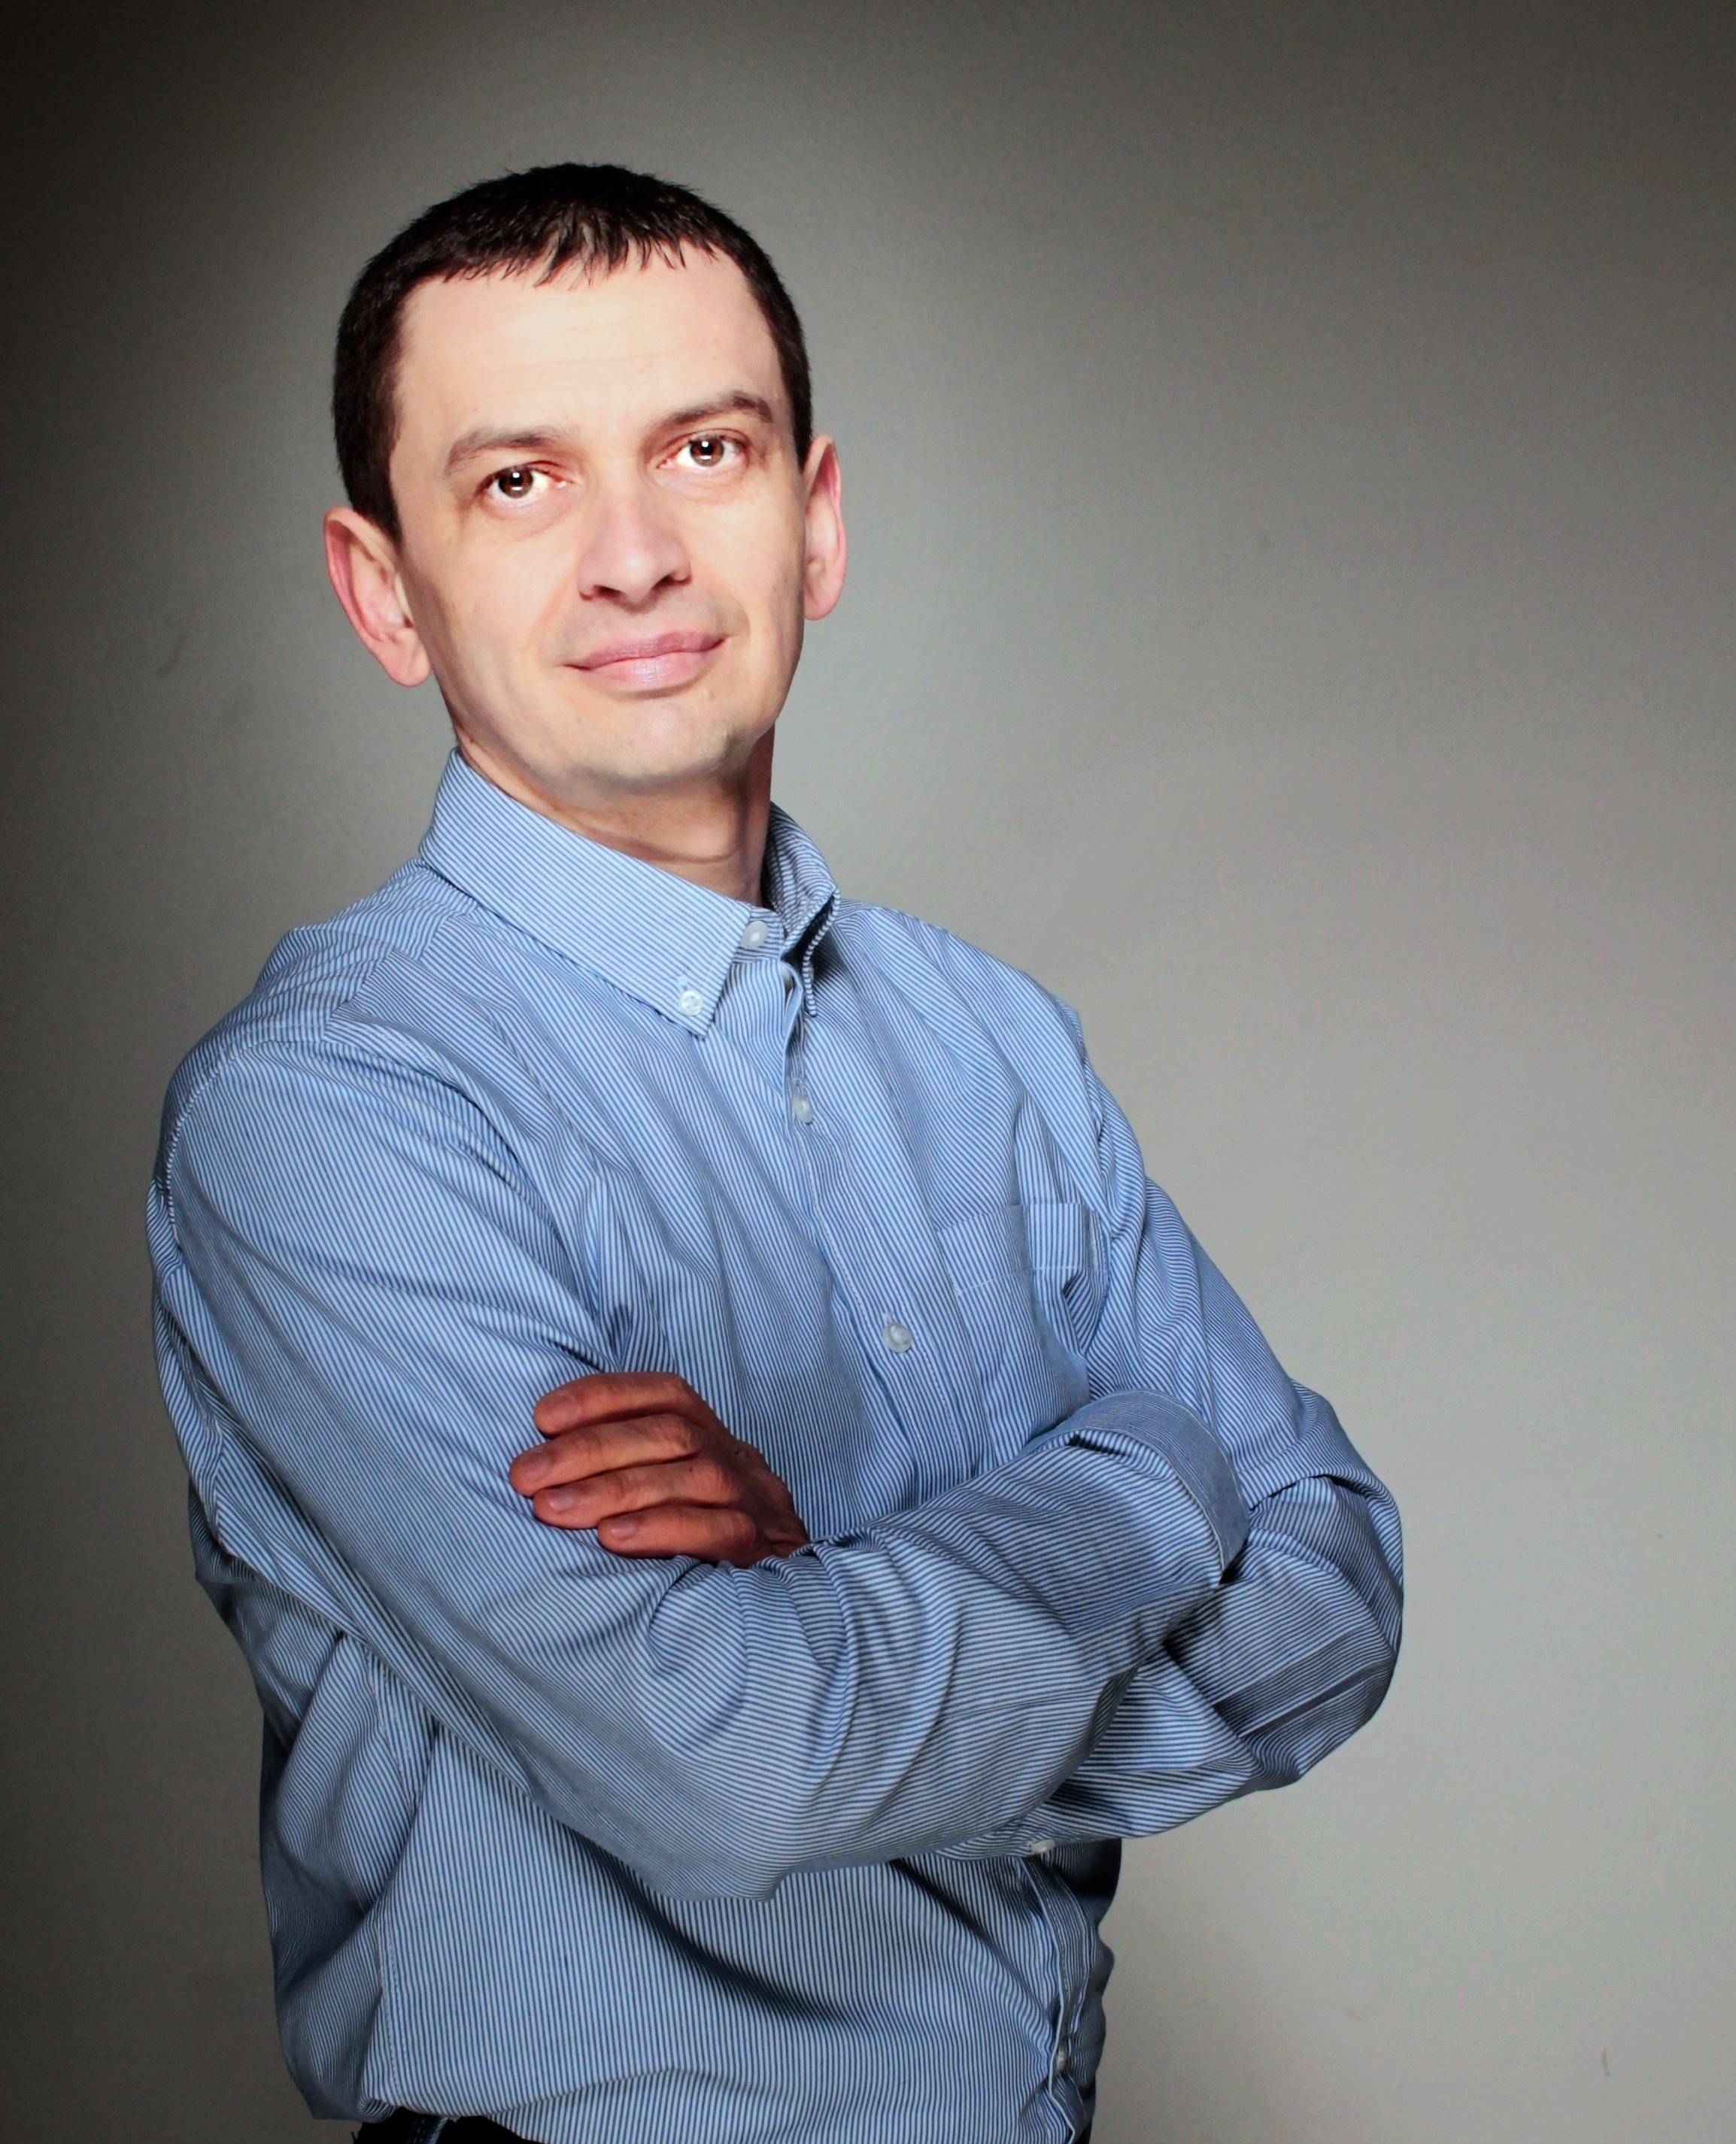 Róka Attila fotója